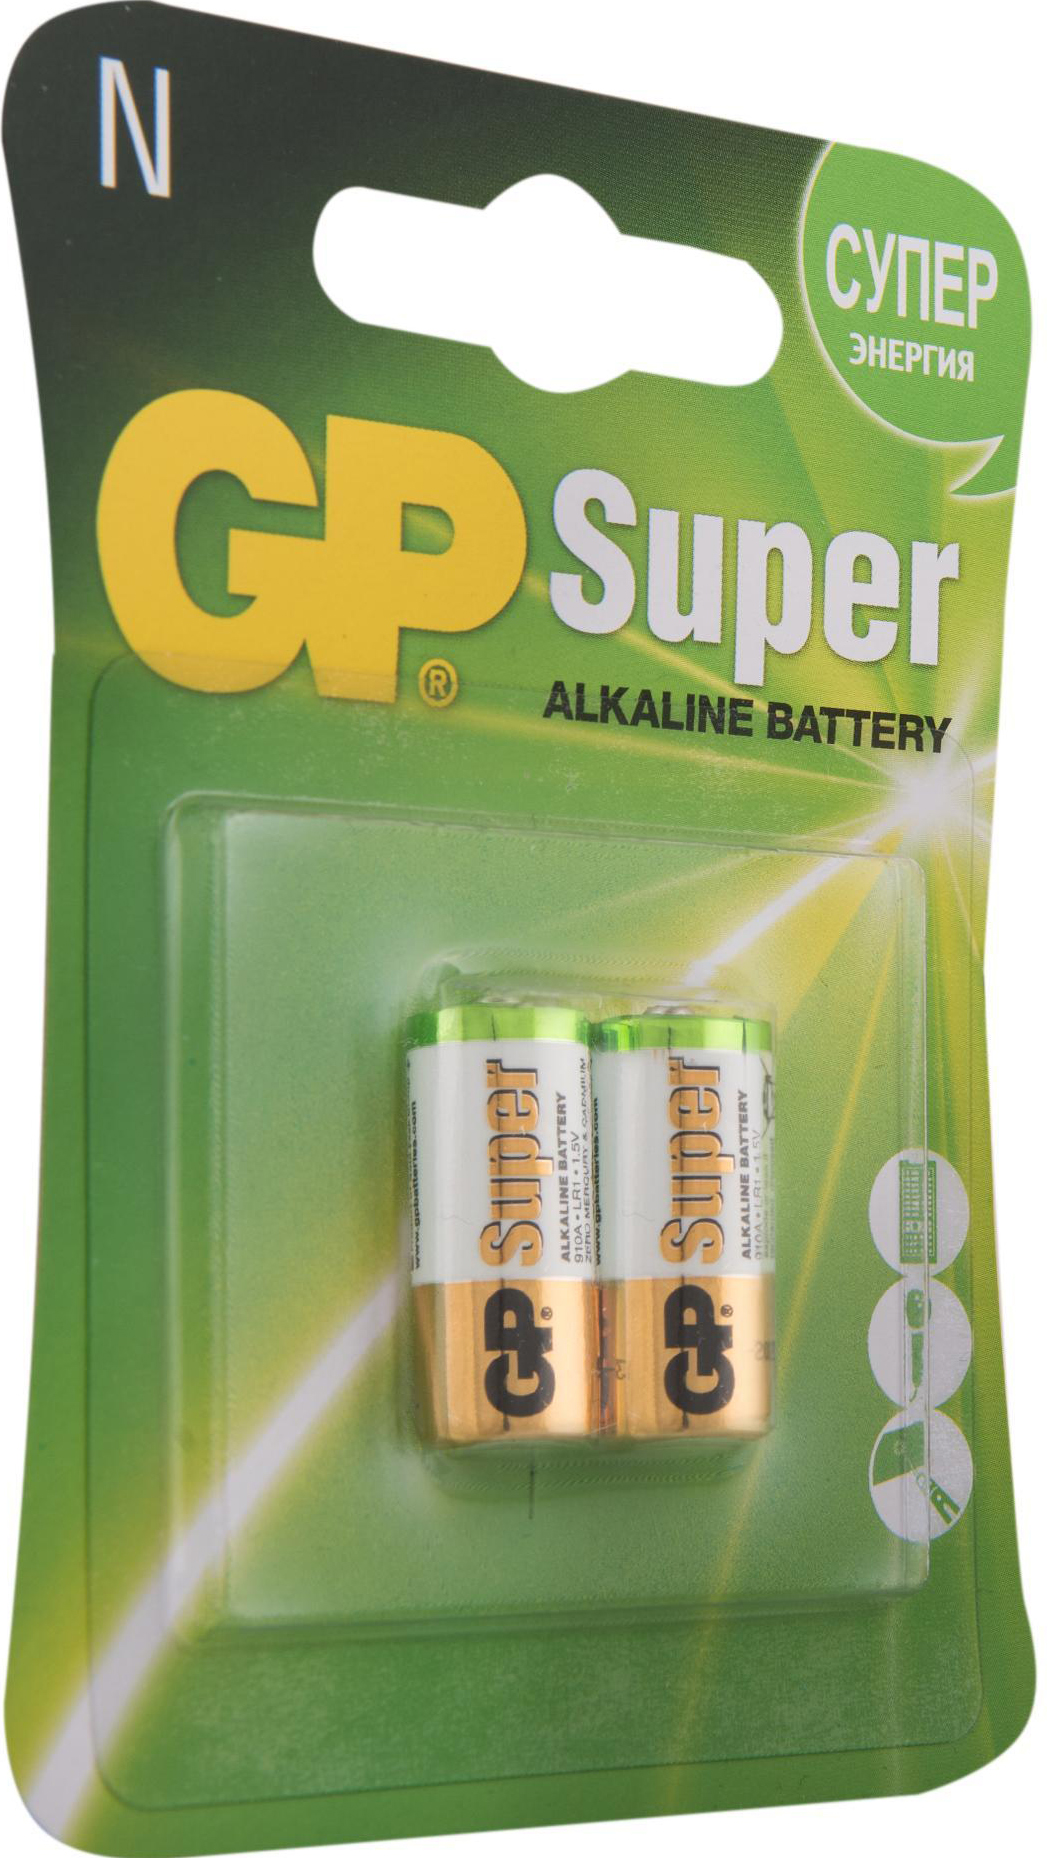 Фото - Алкалиновые батарейки GP Super Alkaline 910A типоразмера N (Блистер, 2 шт) батарейки sonnen alkaline d lr20 13а алкалиновые комплект 2 шт в блистере 451091